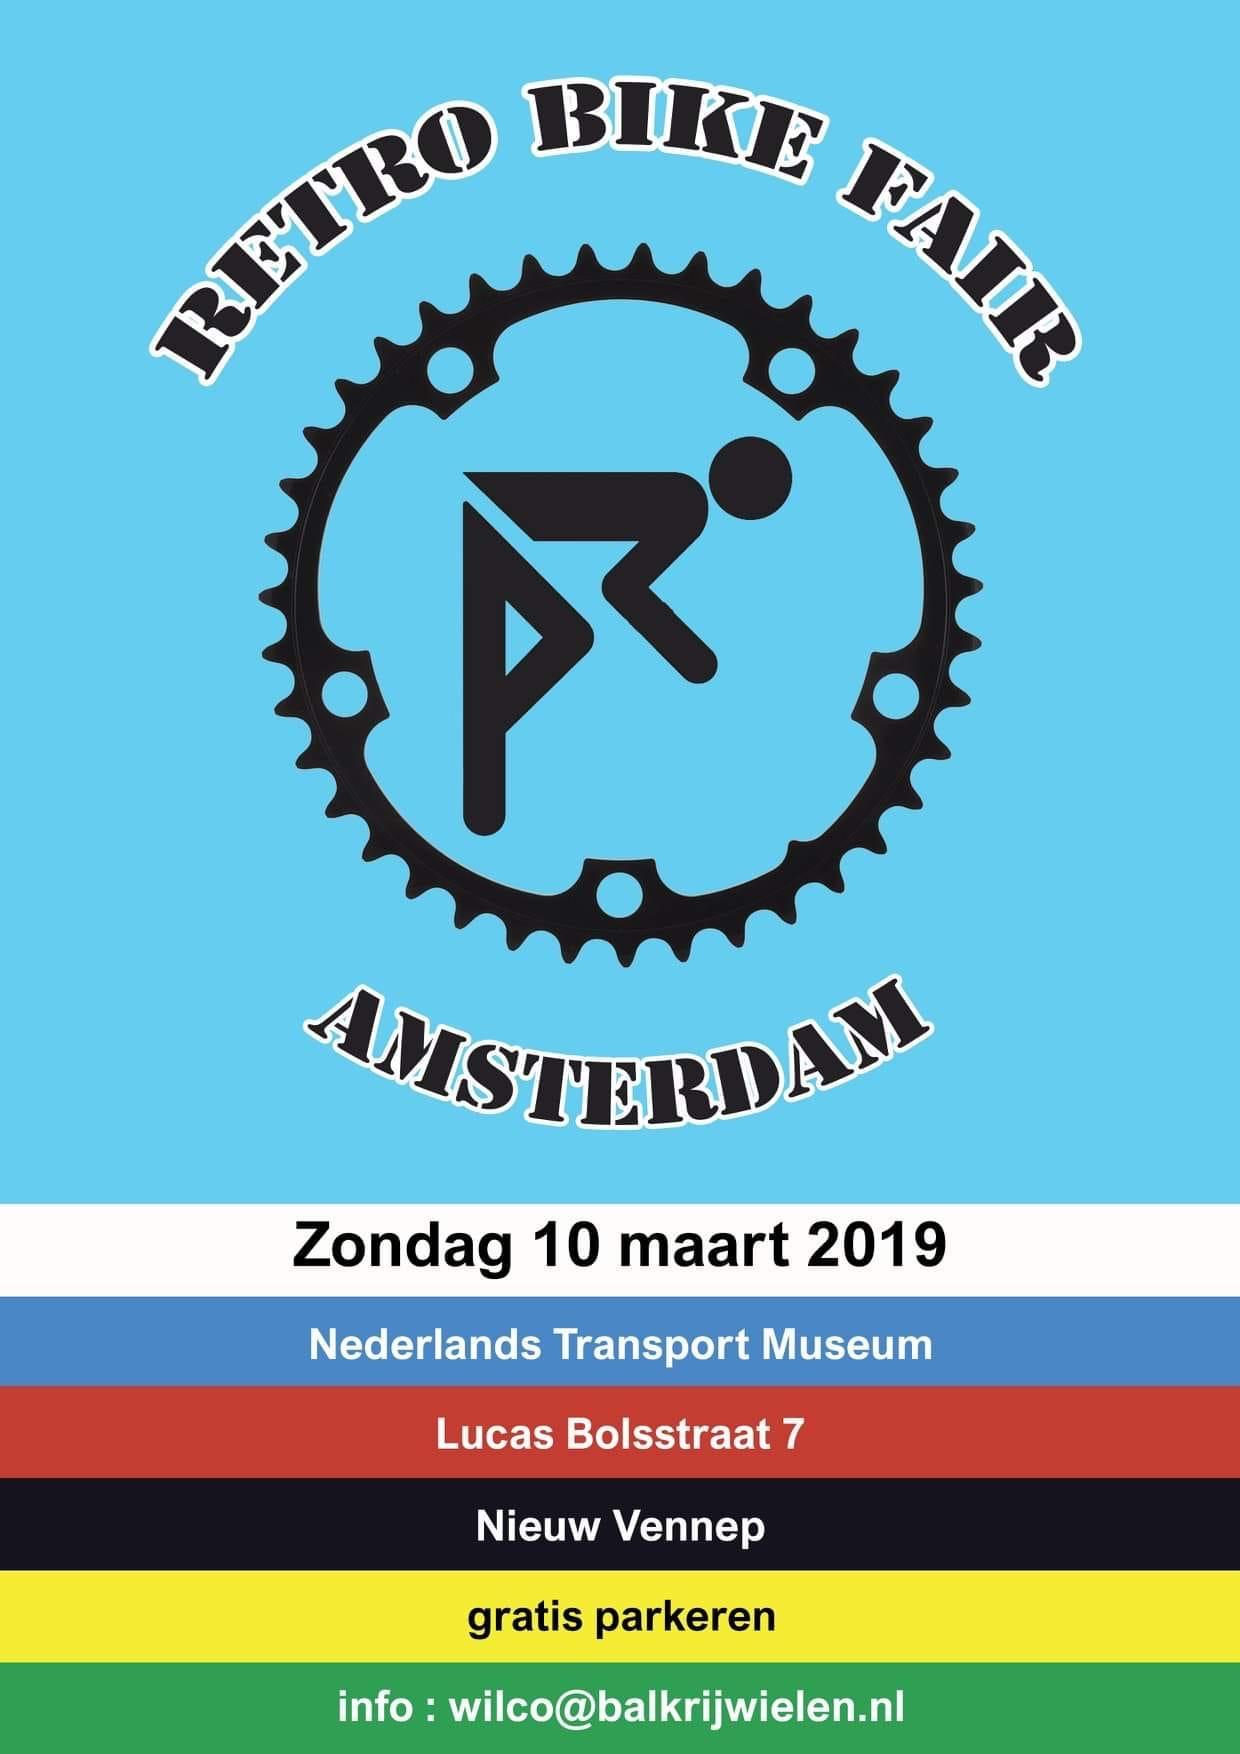 Retro Bike Fair